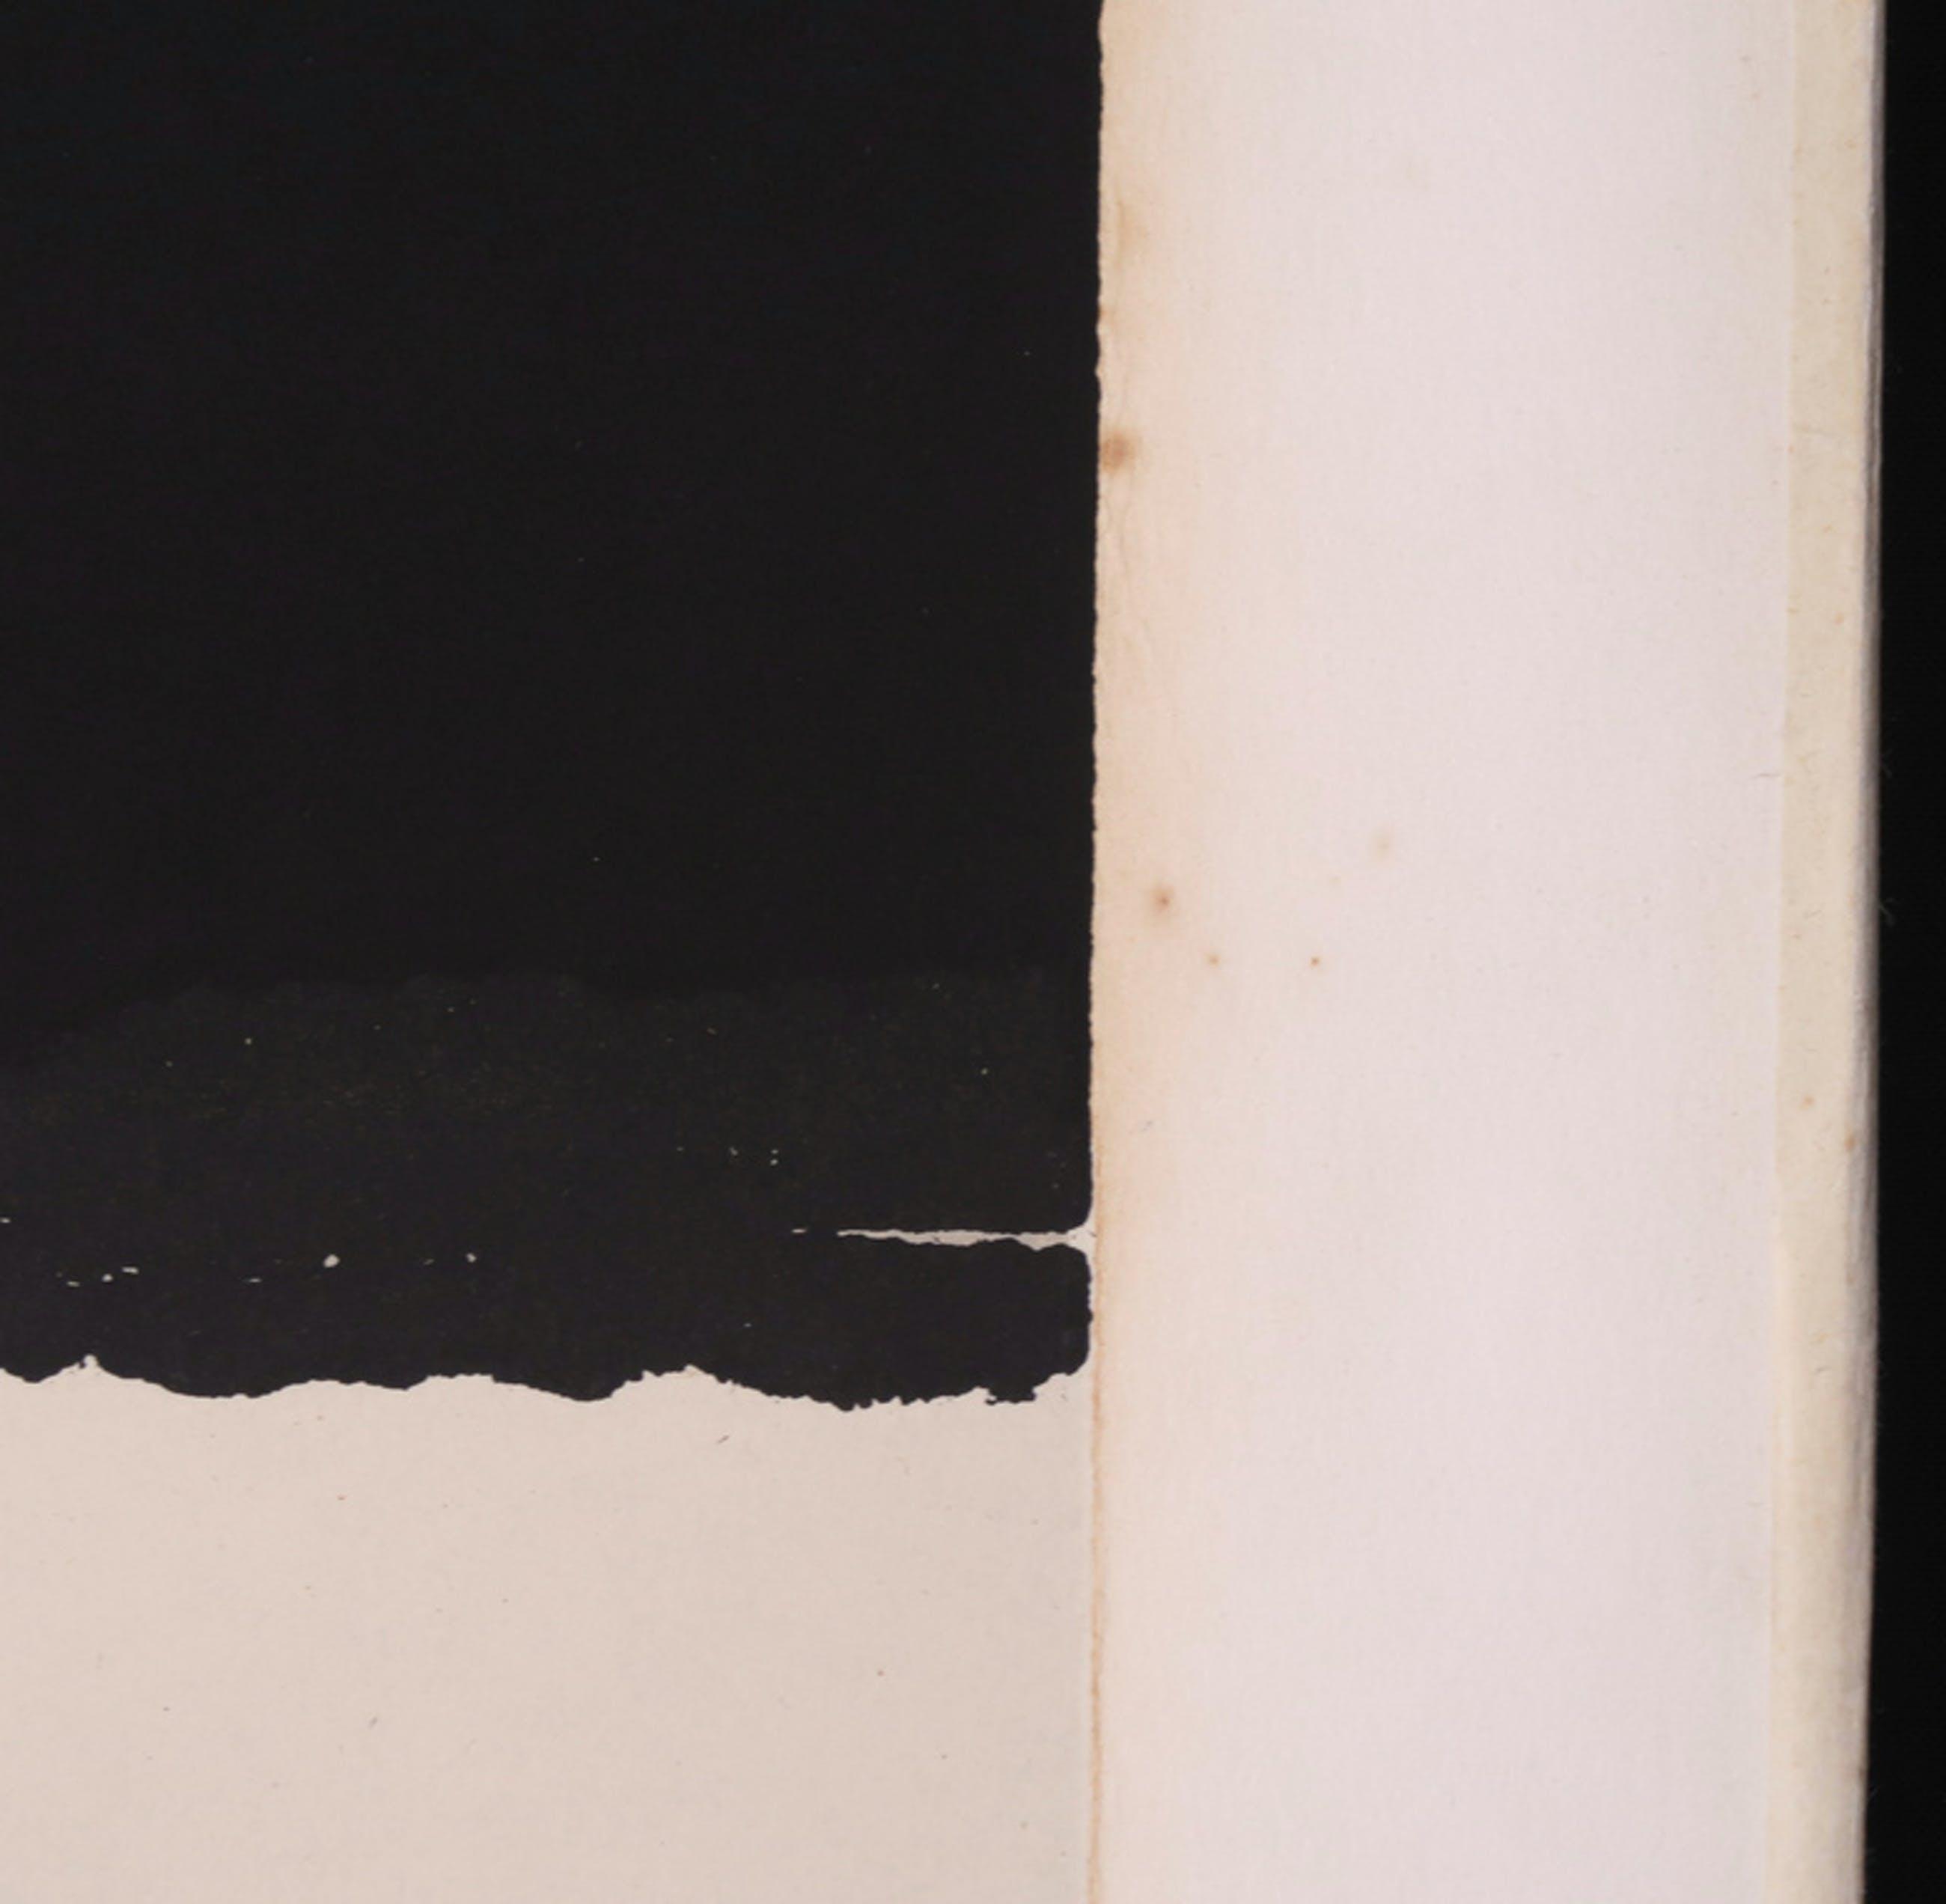 Fon Klement: Boardsnede, Ecriture Ideographique (Groot) kopen? Bied vanaf 75!